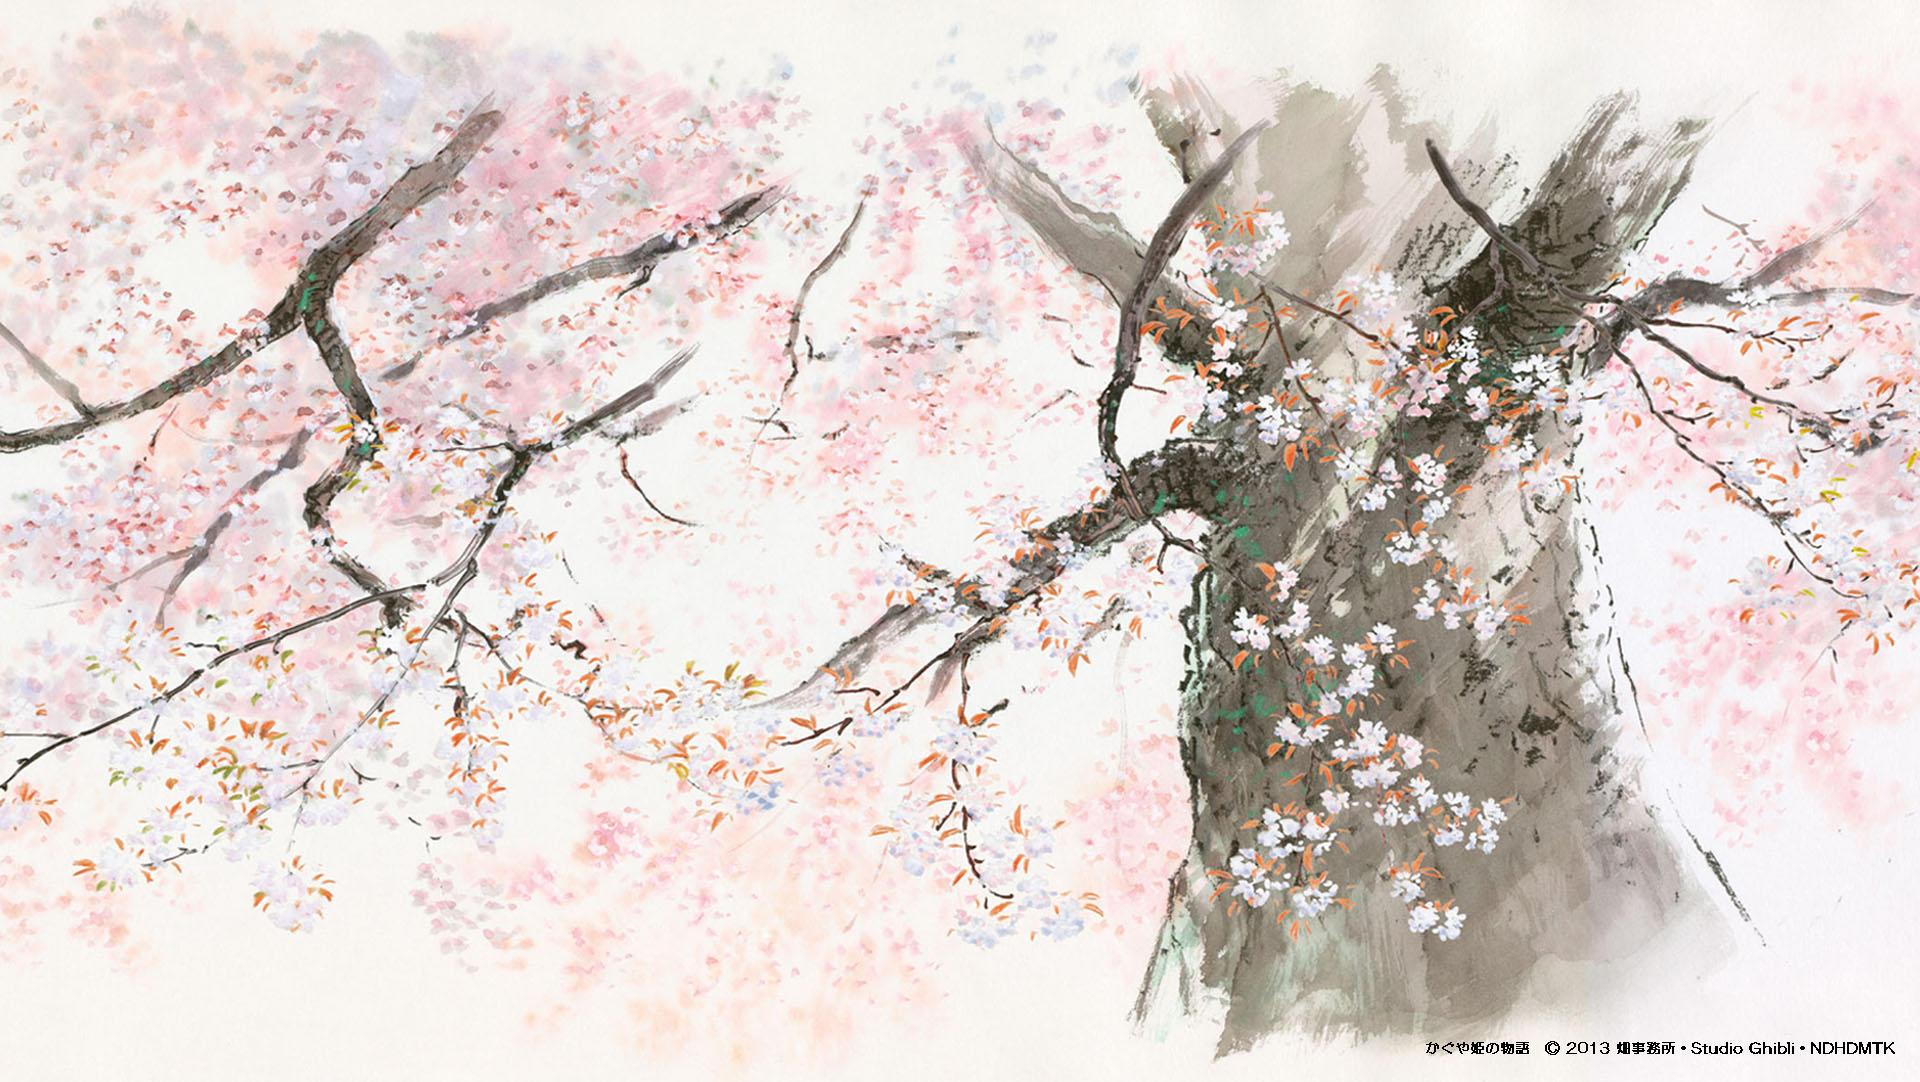 Image by Ghibli studio